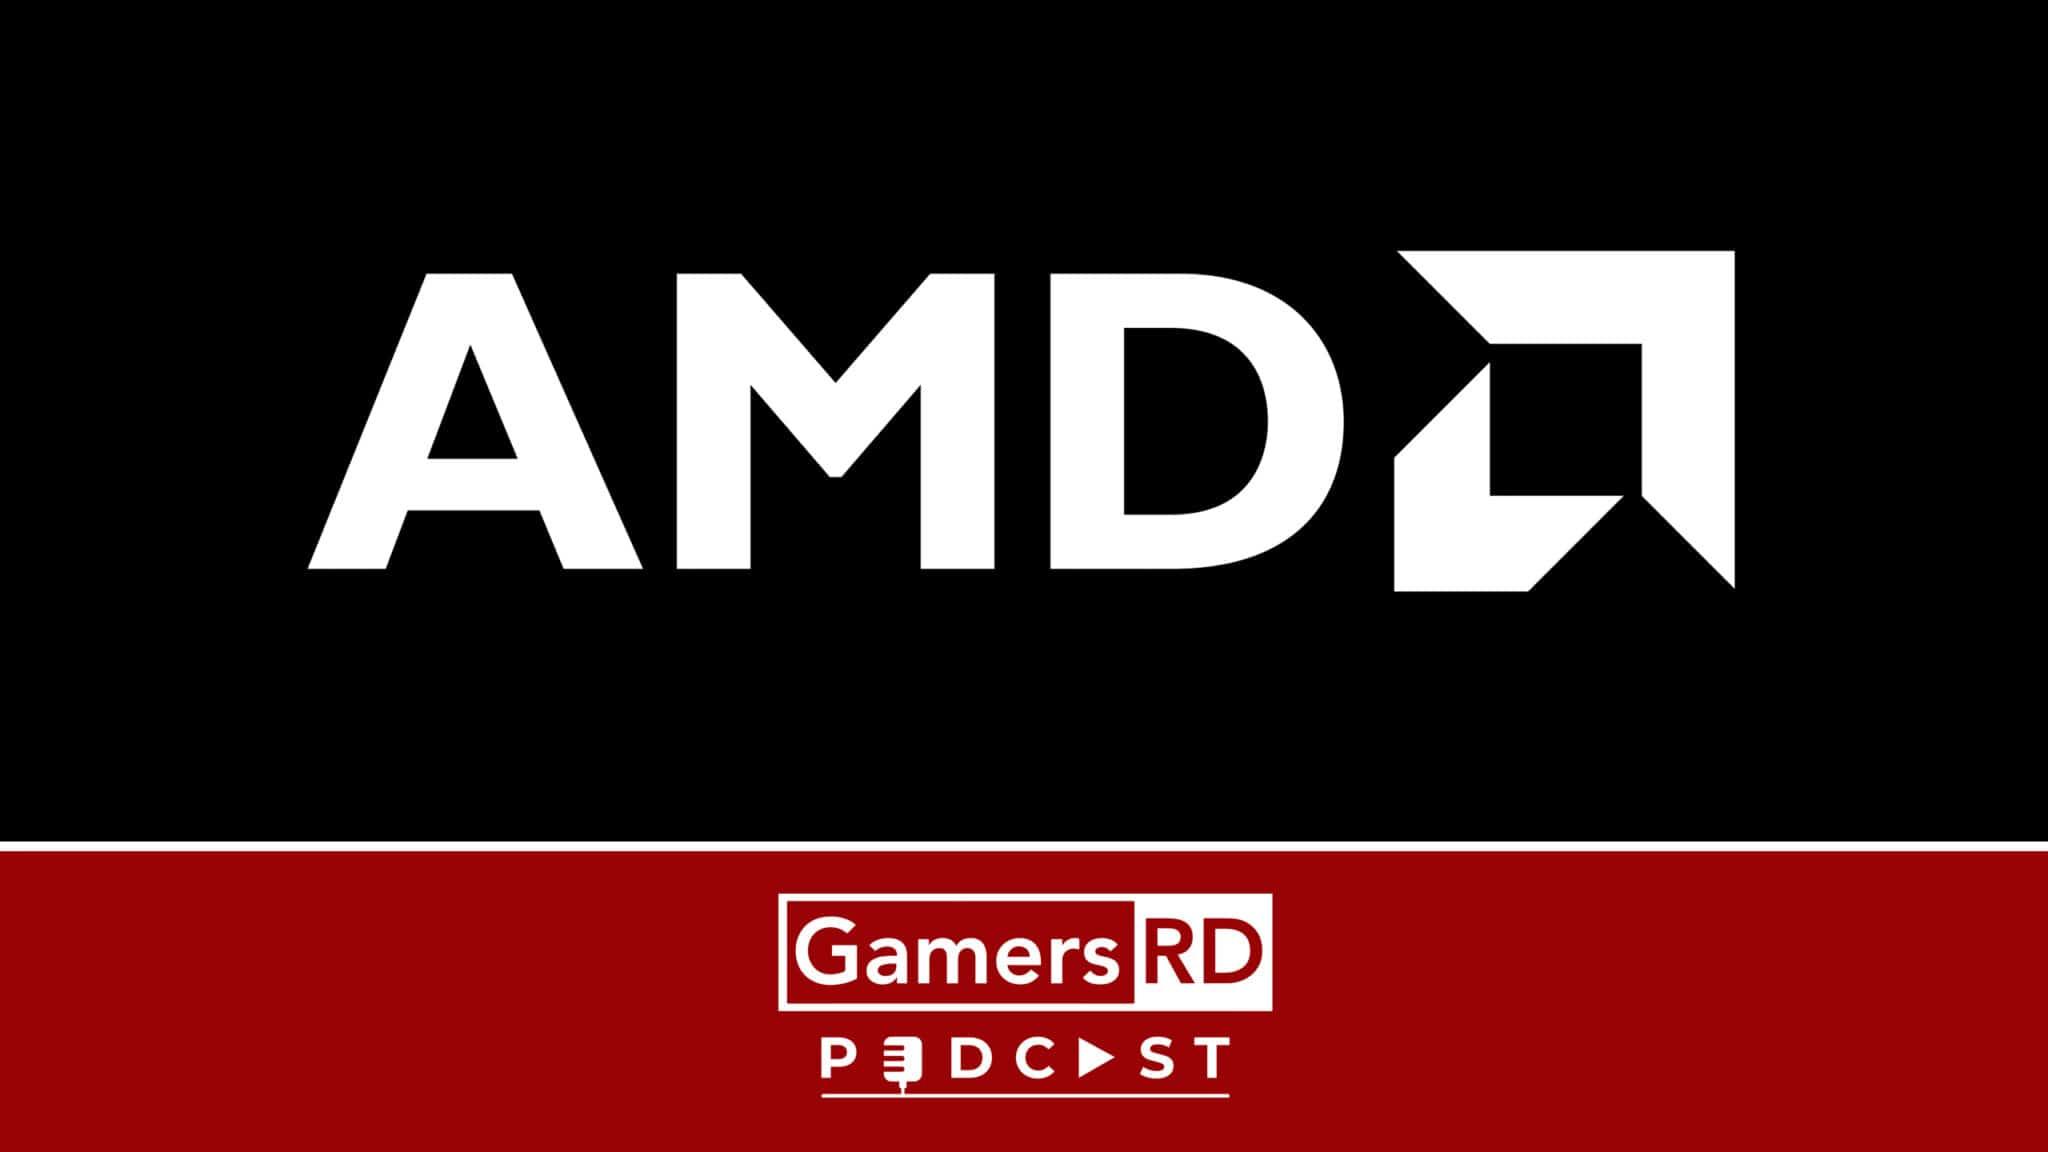 GamersRD Podcast #147 Entrevista a Marketing Manager de AMD para México, Centroamérica y Caribe